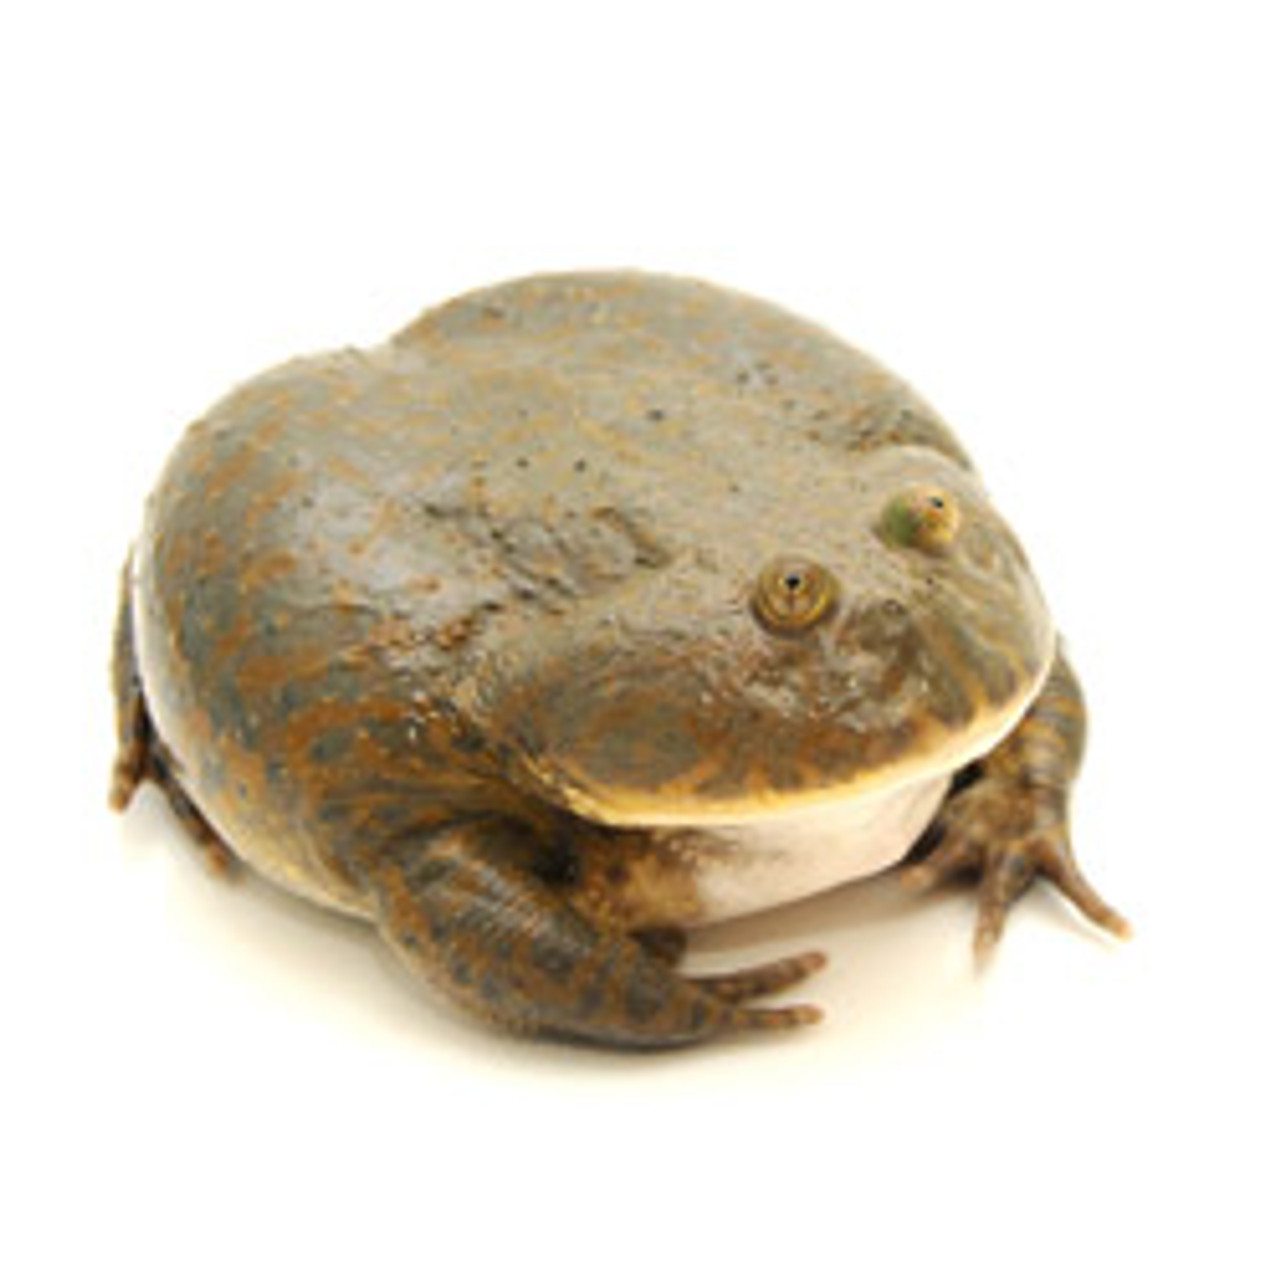 Budgett's Frog (Adults)